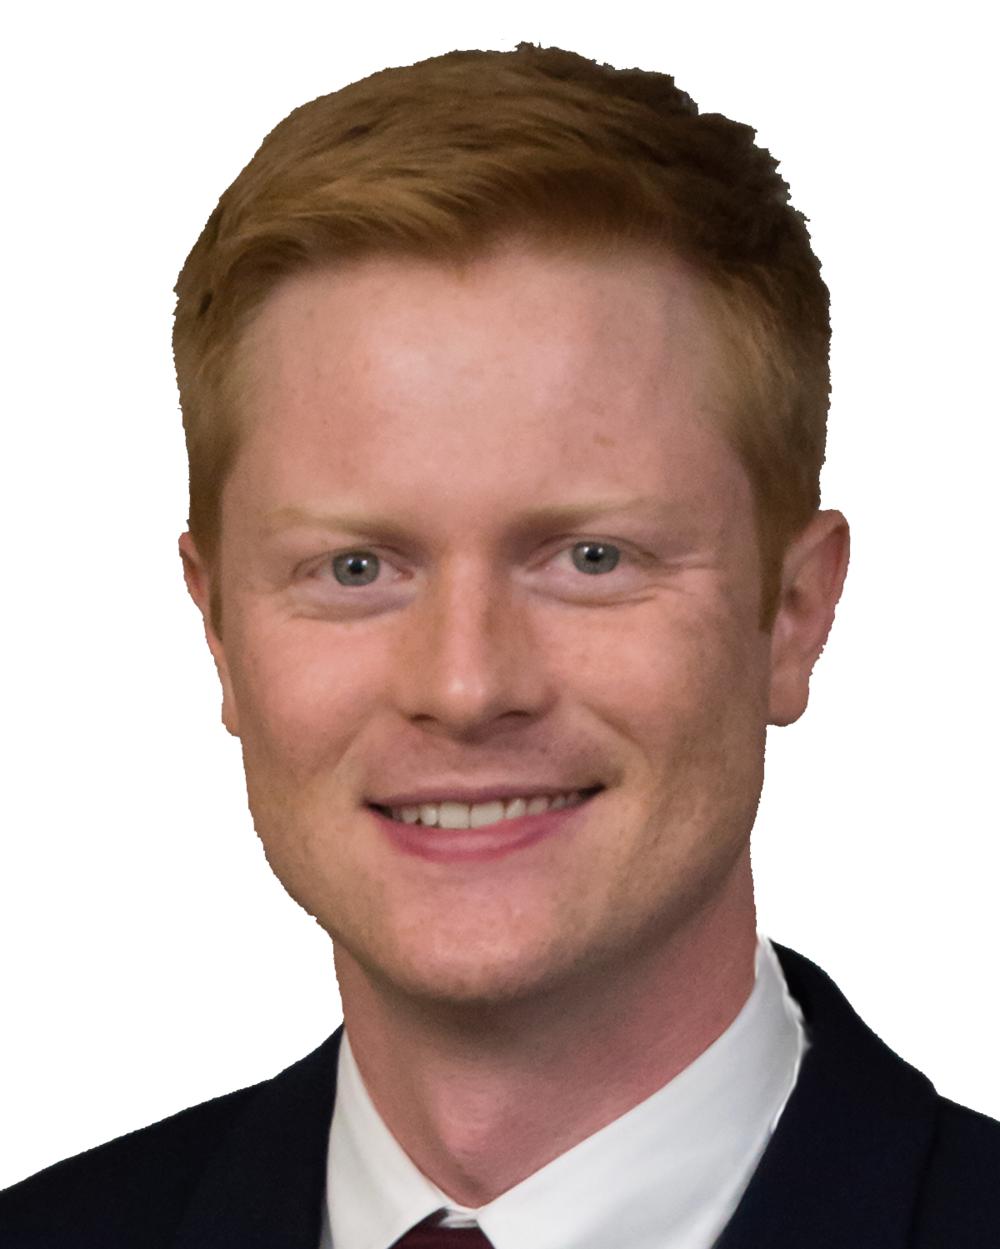 Alexander Carlisle - Associate